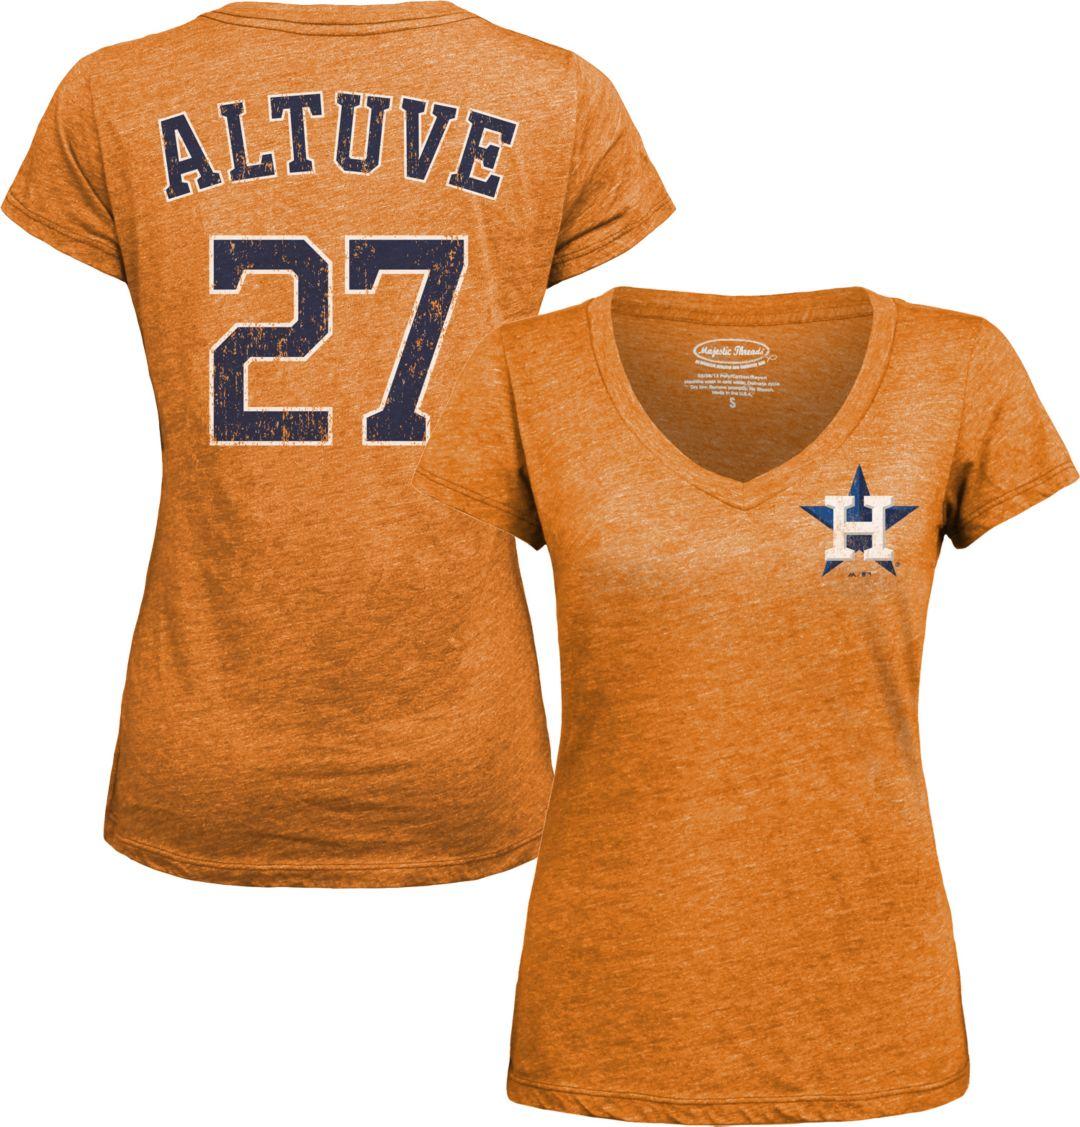 separation shoes b2954 66232 Majestic Threads Women's Houston Astros Jose Altuve Orange V-Neck T-Shirt